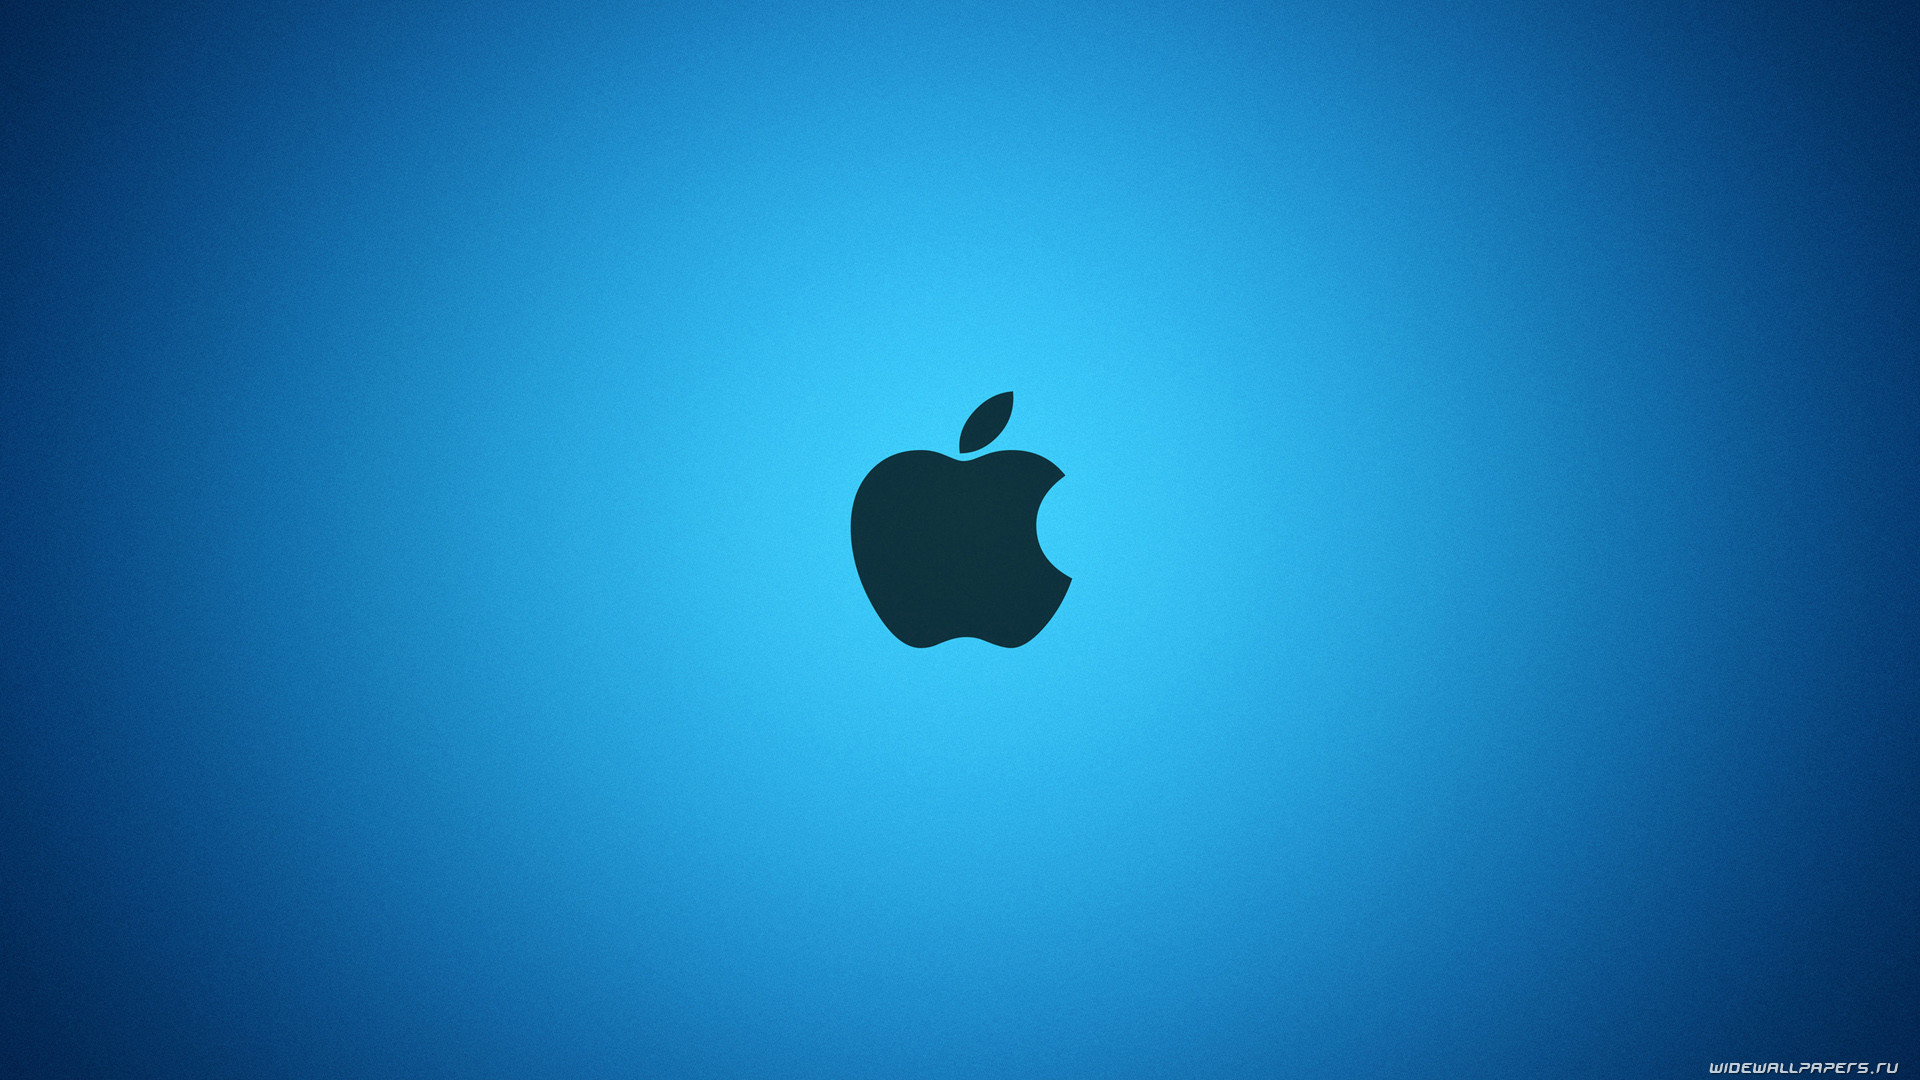 Apple Wallpaper 1920×1080 Mw0619